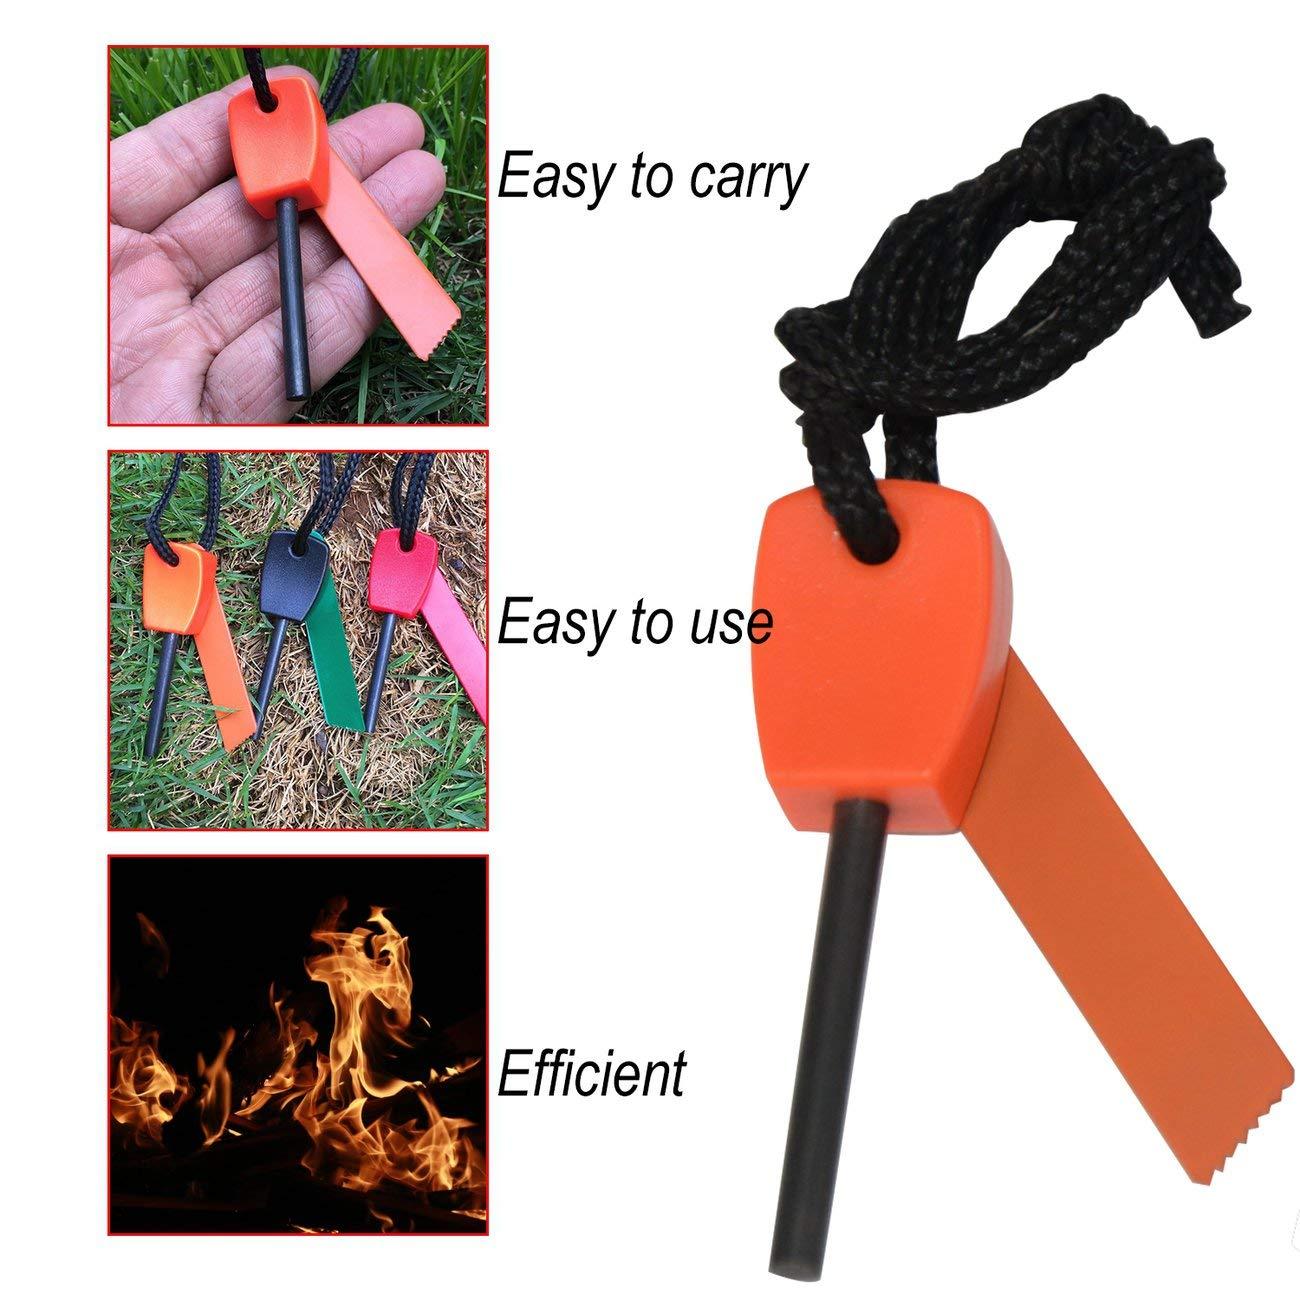 Equipo de Supervivencia al Aire Libre para Camping Versi/ón econ/ómica de Mini Flint Impermeabilizaci/ón Franja de magnesio Naranja